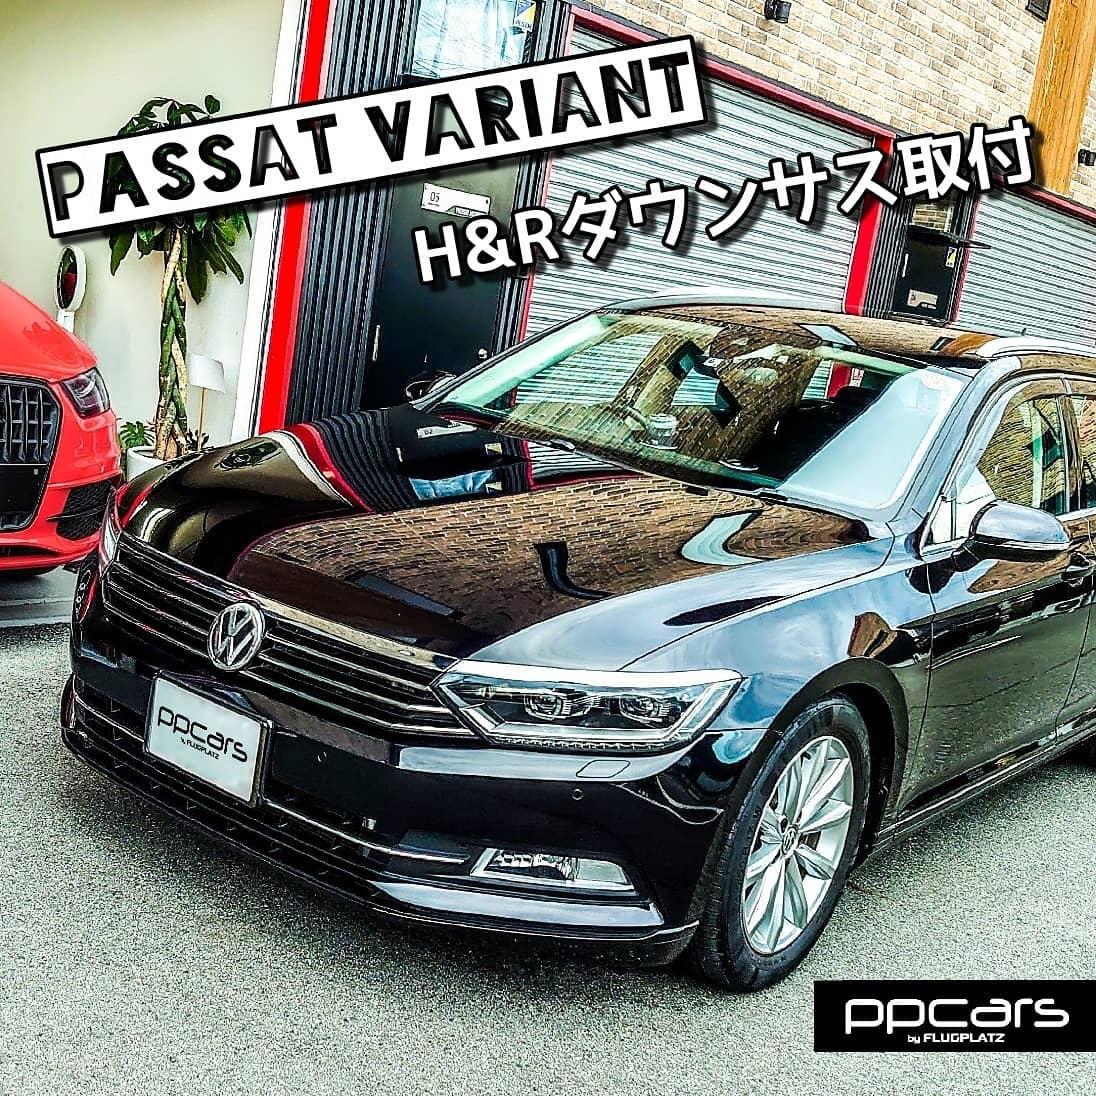 Passat (3G/B8) Variant x H&Rダウンサス